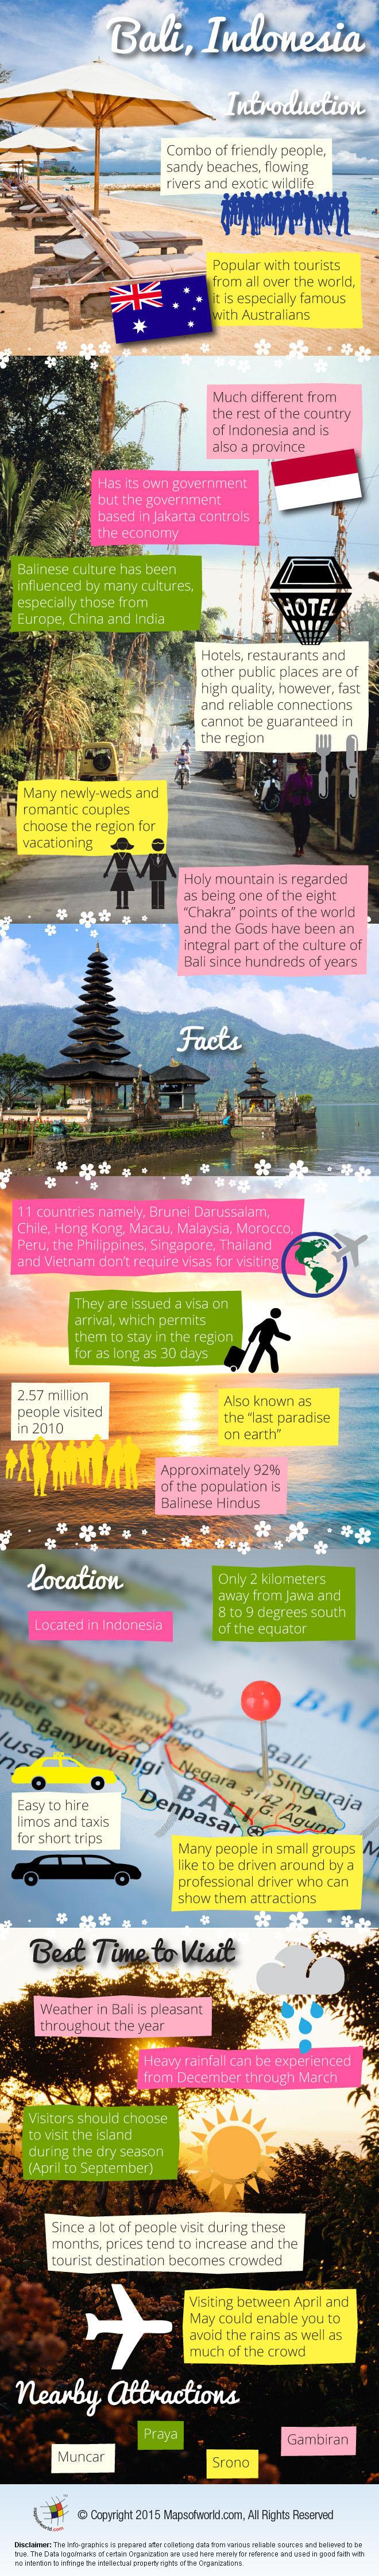 Bali Infographic